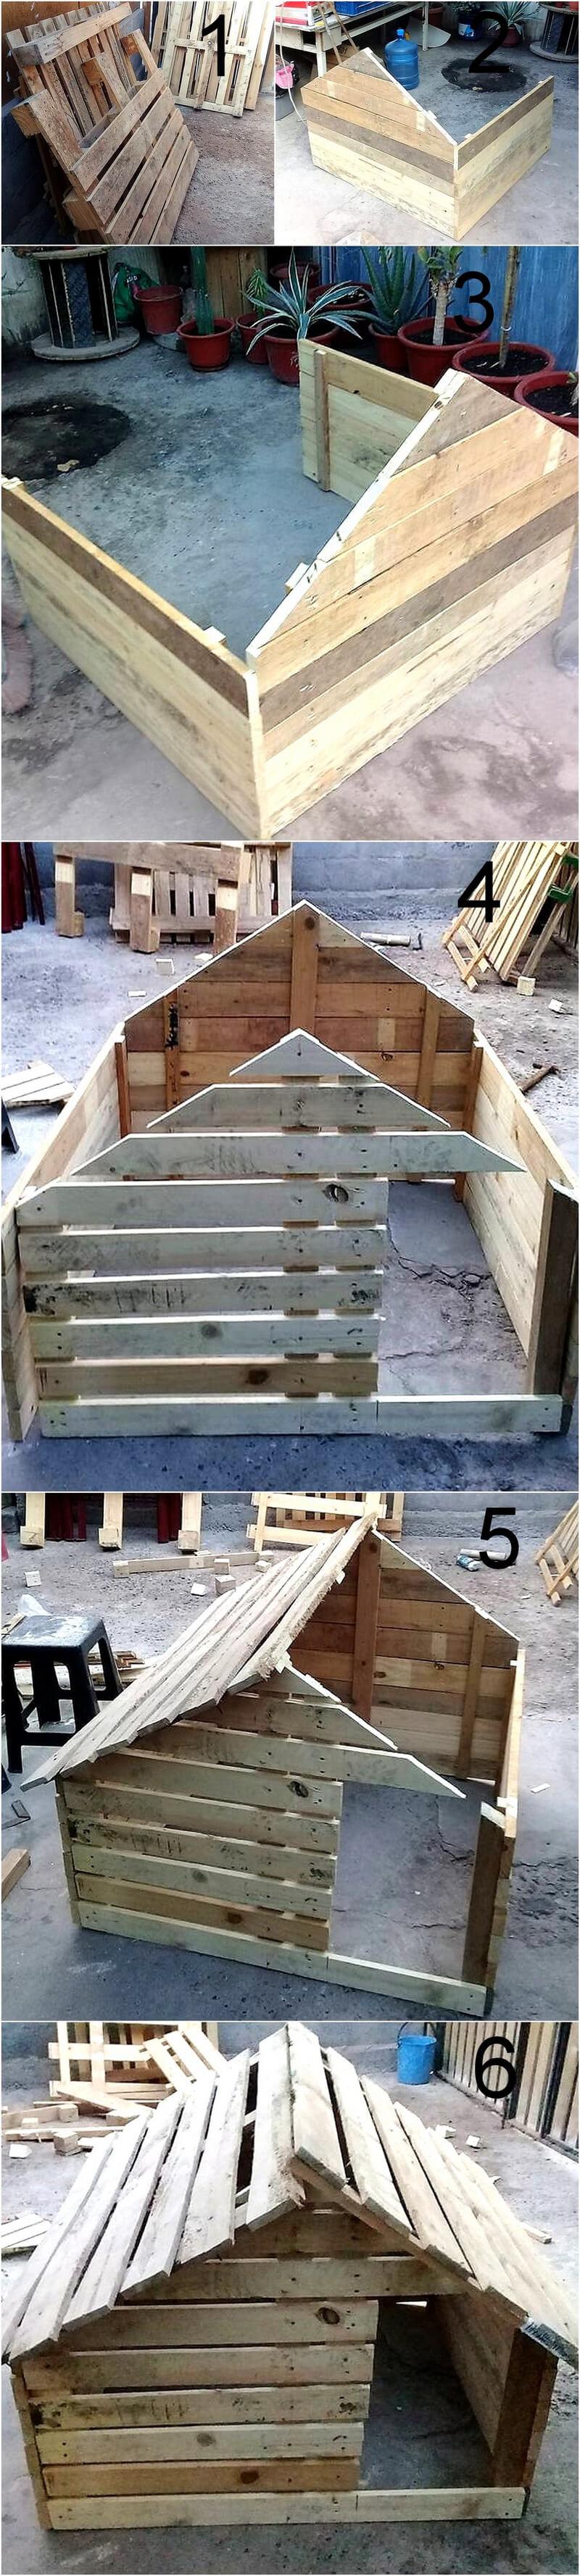 diy pallets made dog house